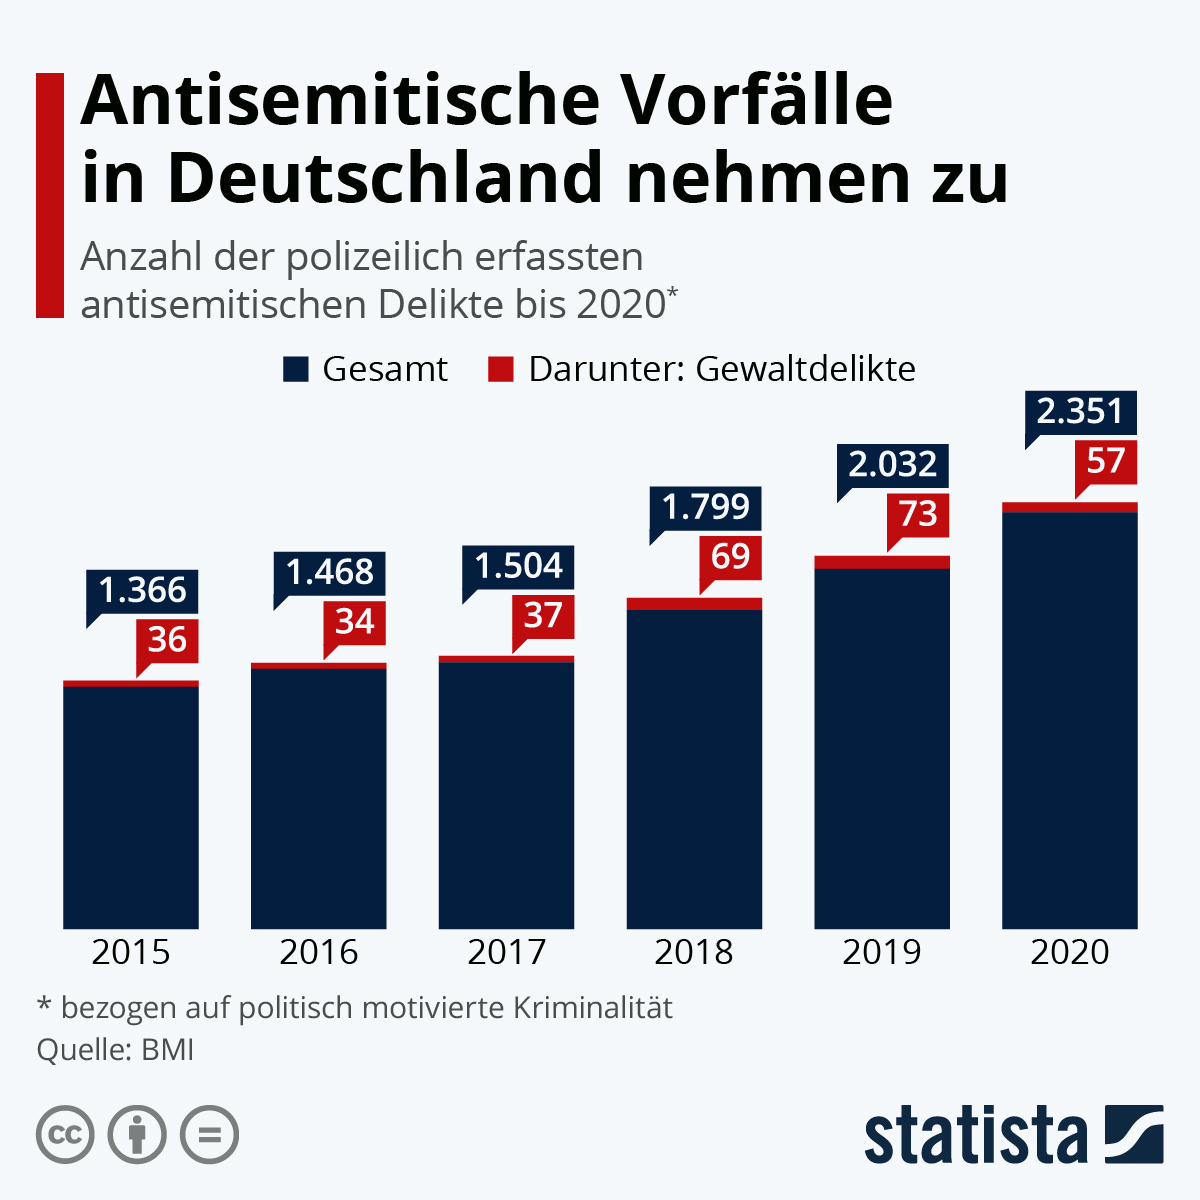 Infografik: Antisemitische Gewalttaten nehmen zu | Statista